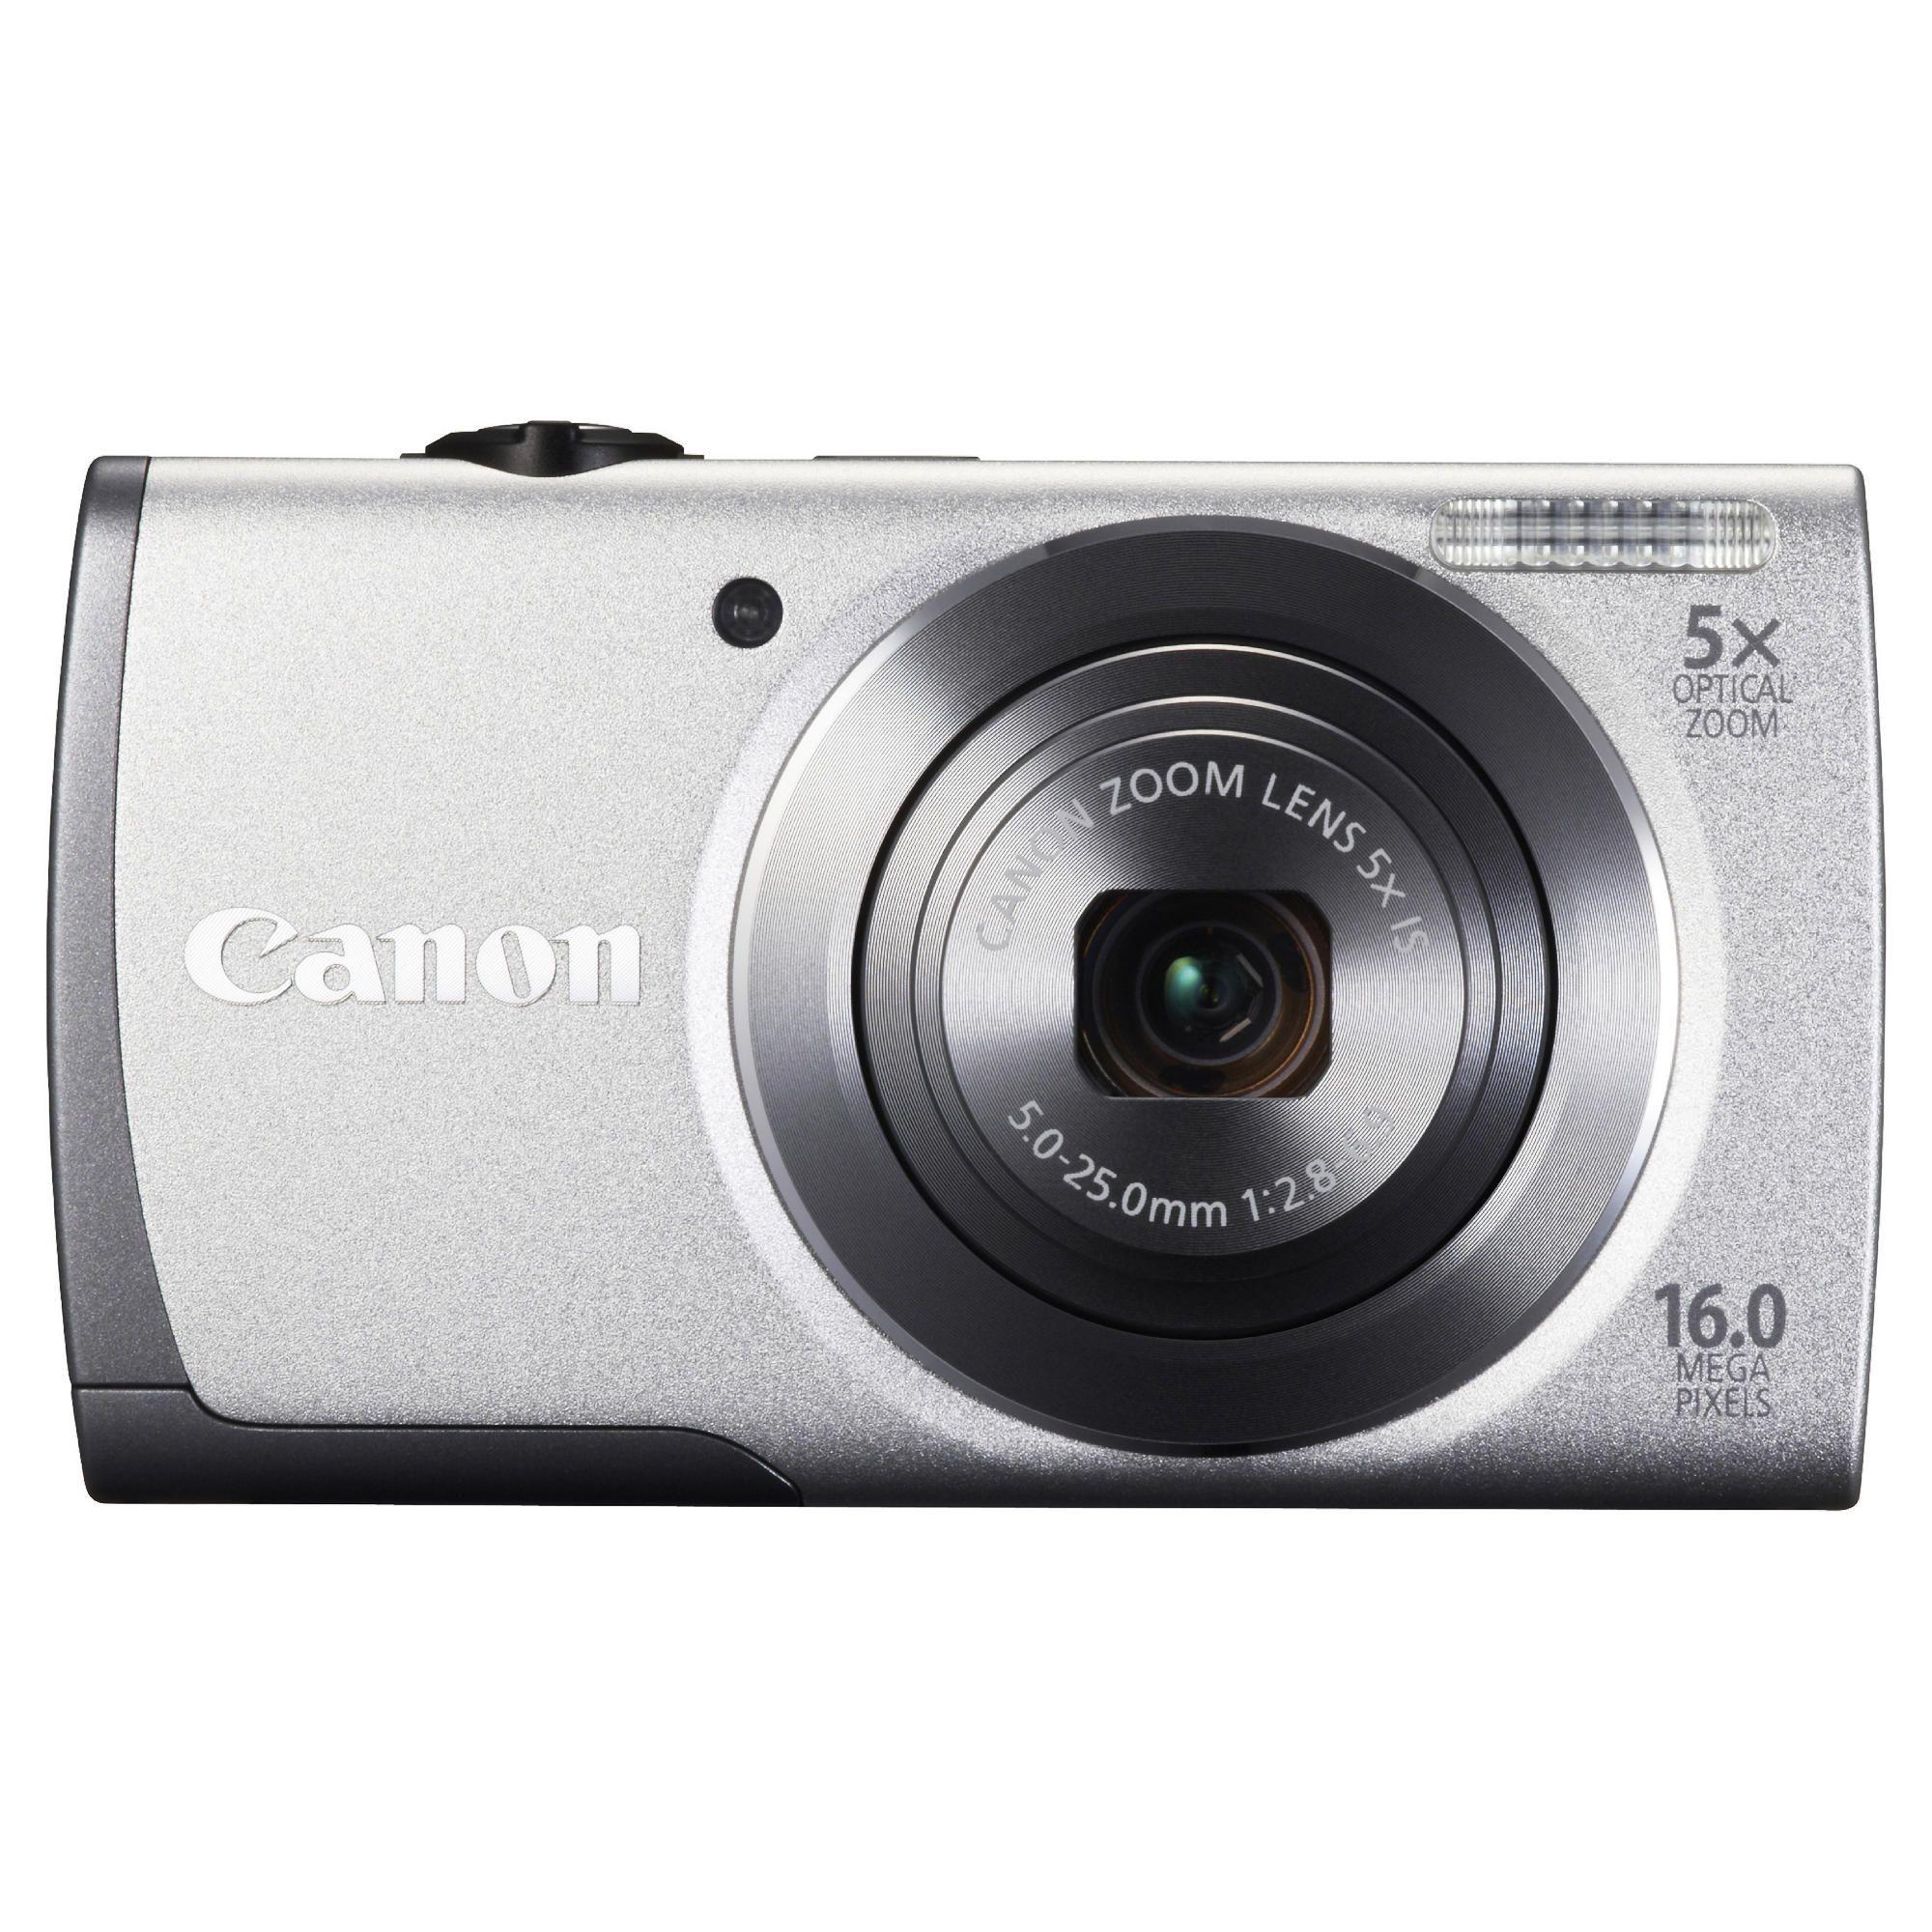 Canon A3500 Digital Camera, Silver, 16MP, 5x Optical Zoom, 2.7 inch LCD Screen